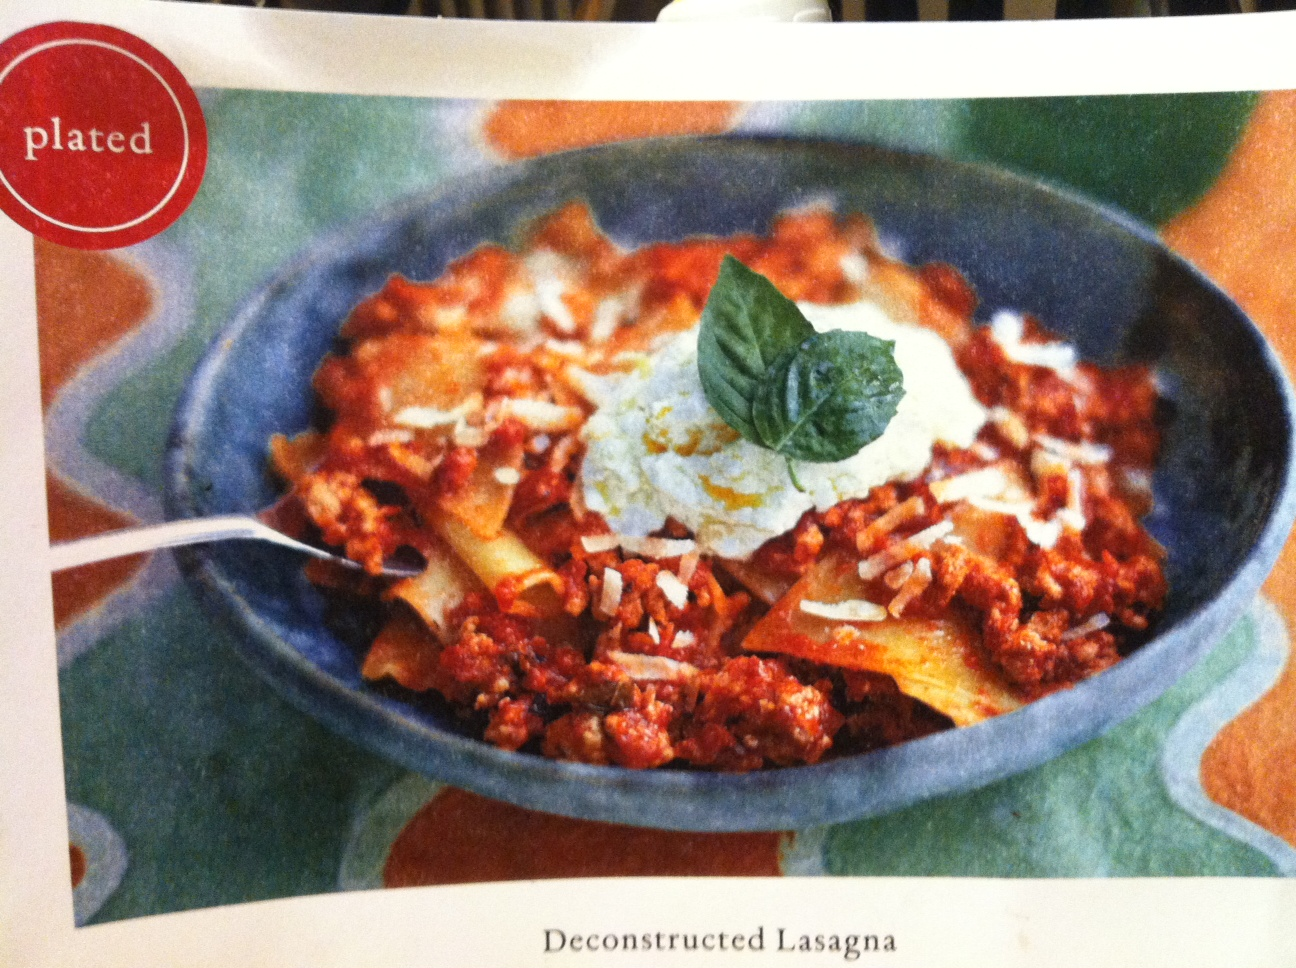 Plated Recipe: Deconstructed Lasagna